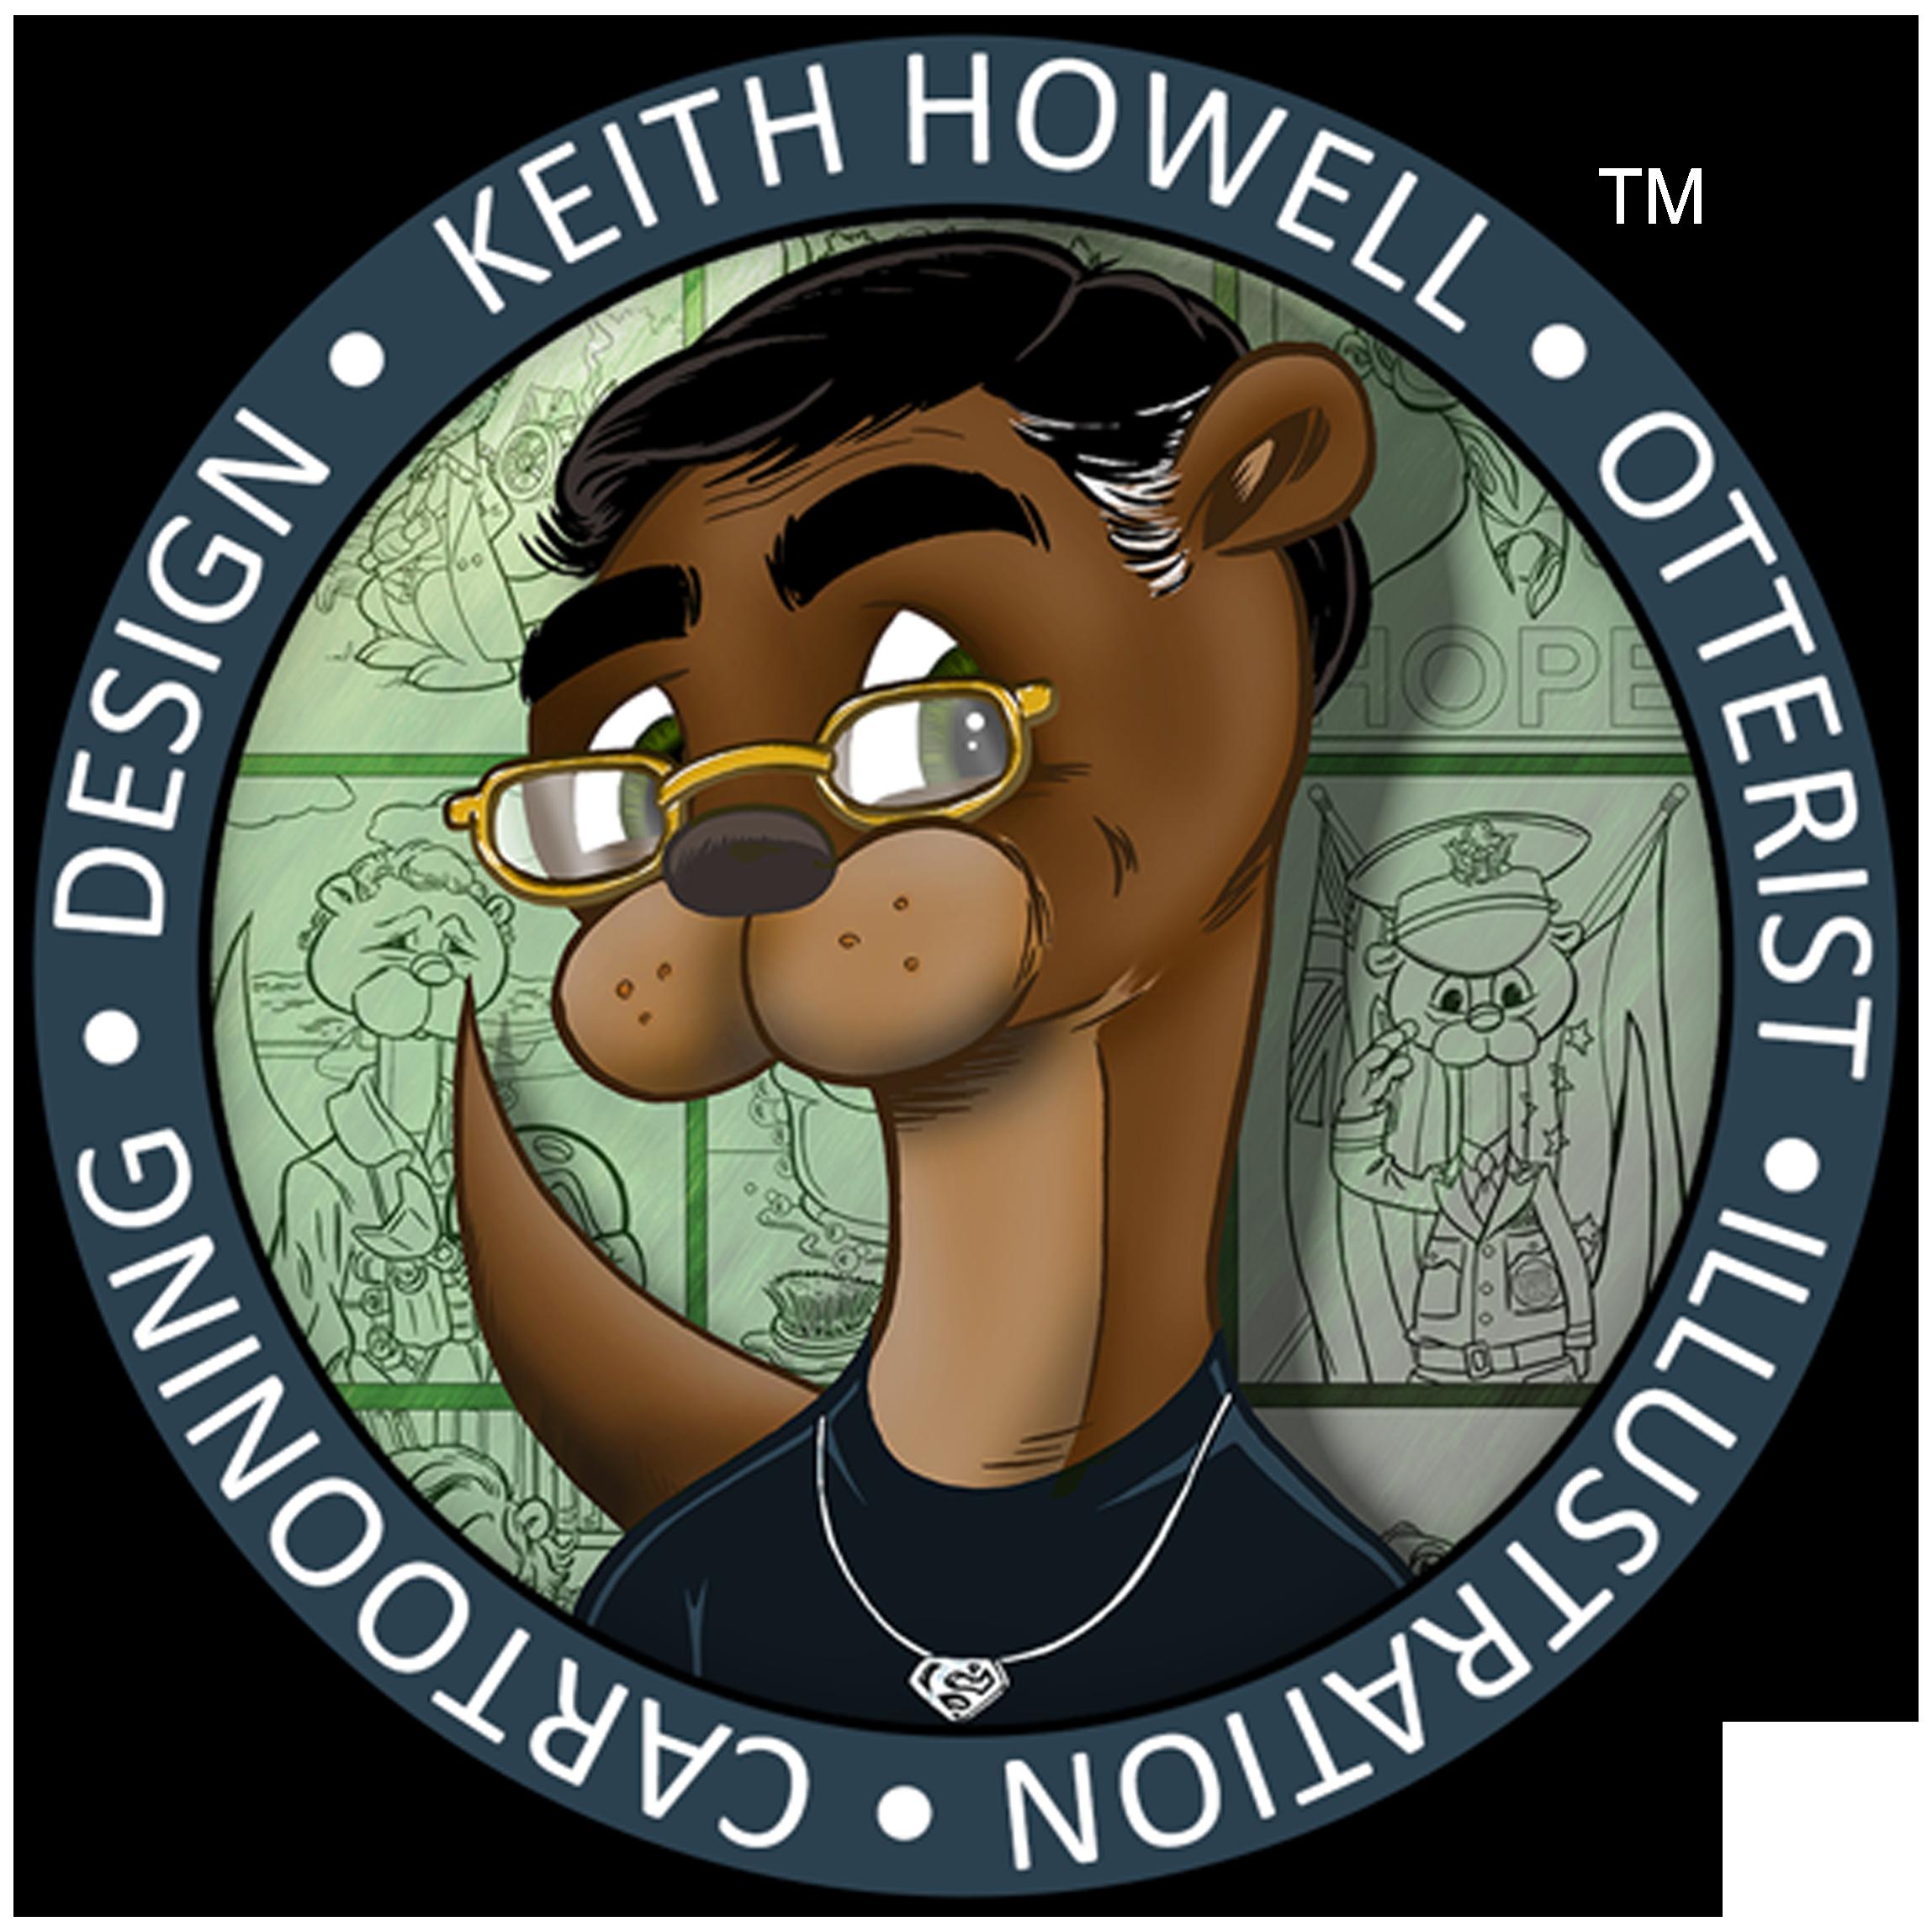 Keith Howell Art